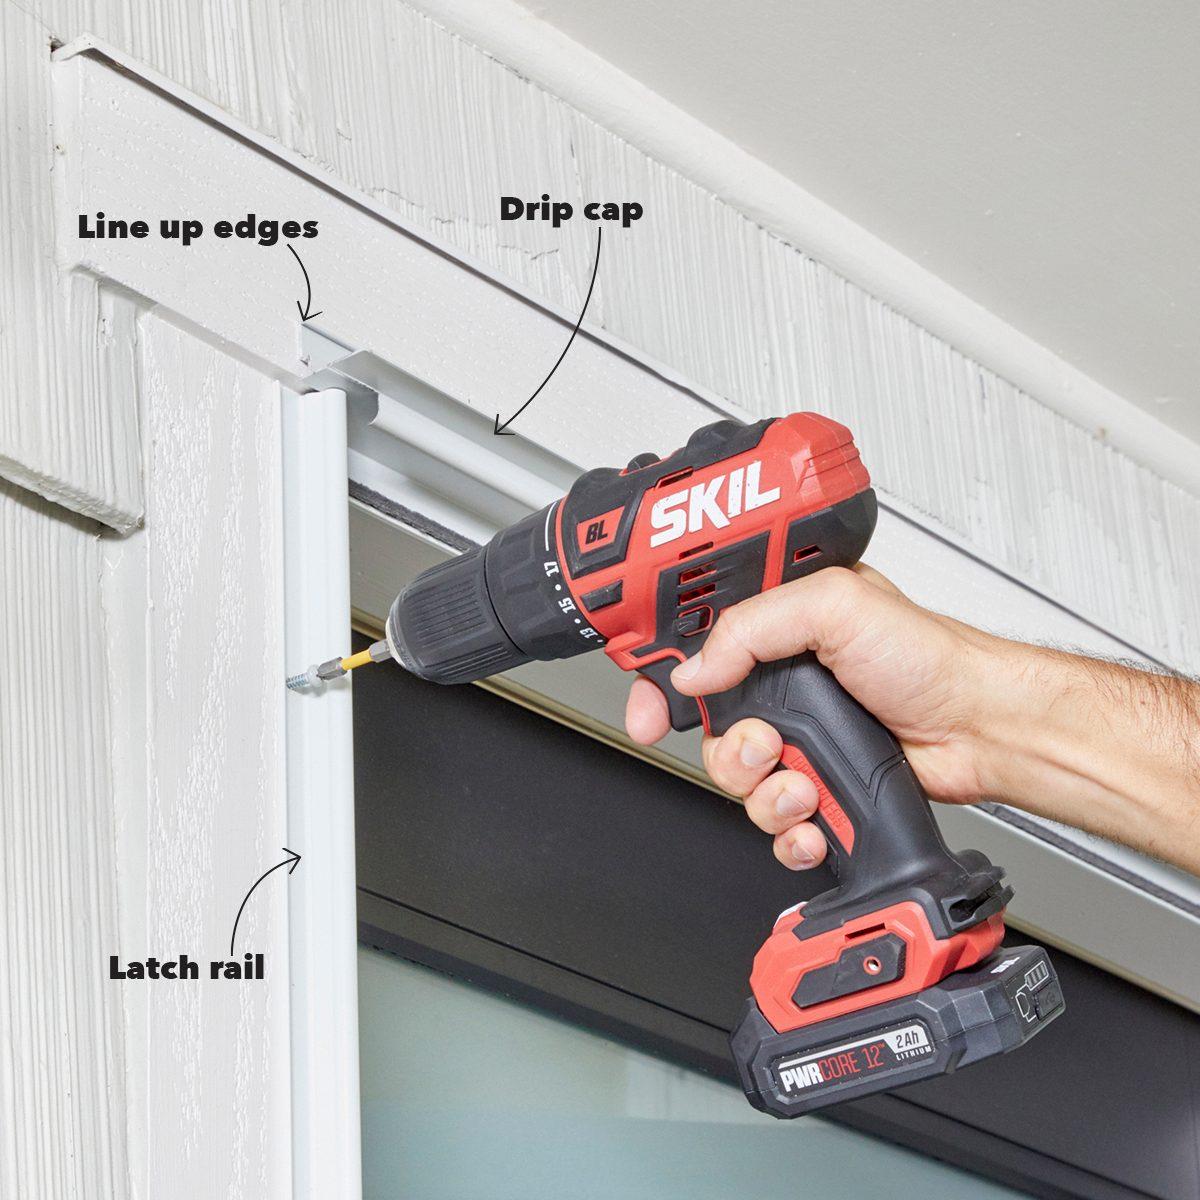 Install Drip Cap and Latch Rail